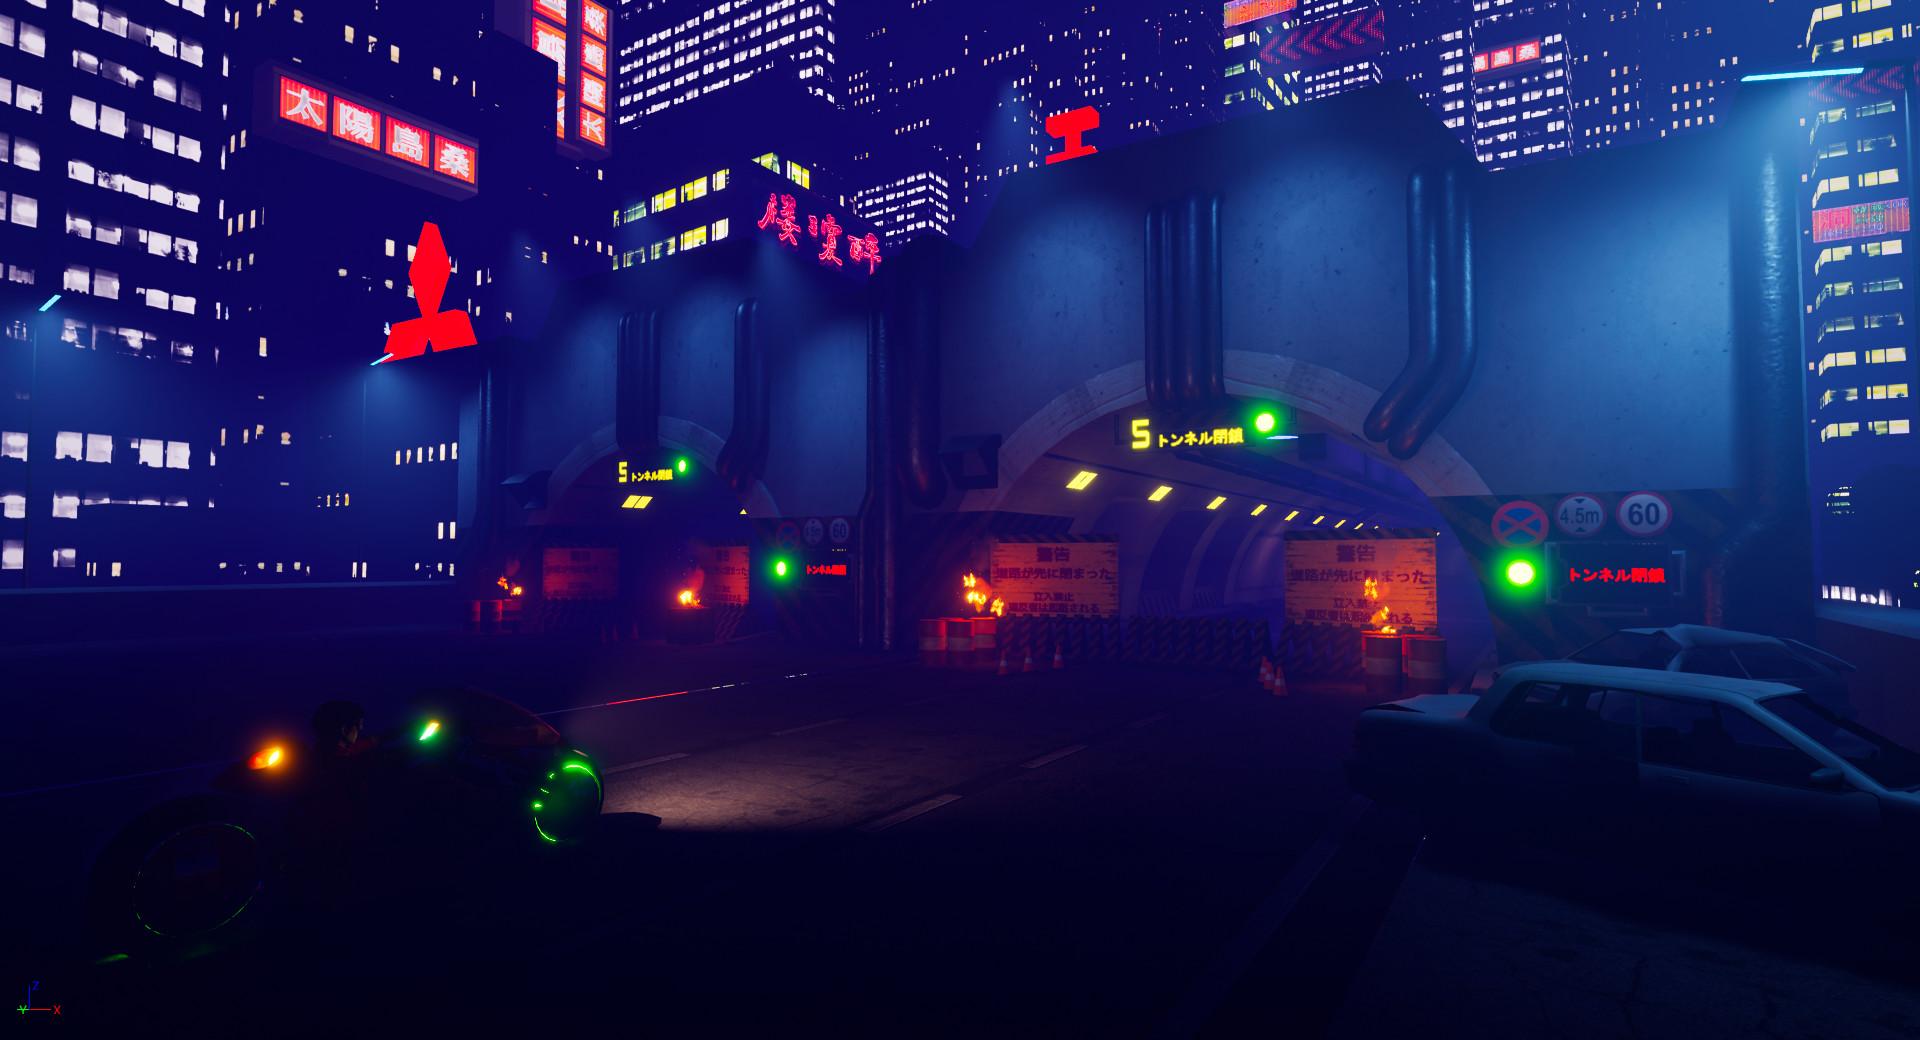 Akira Highway Environment (W.I.P)